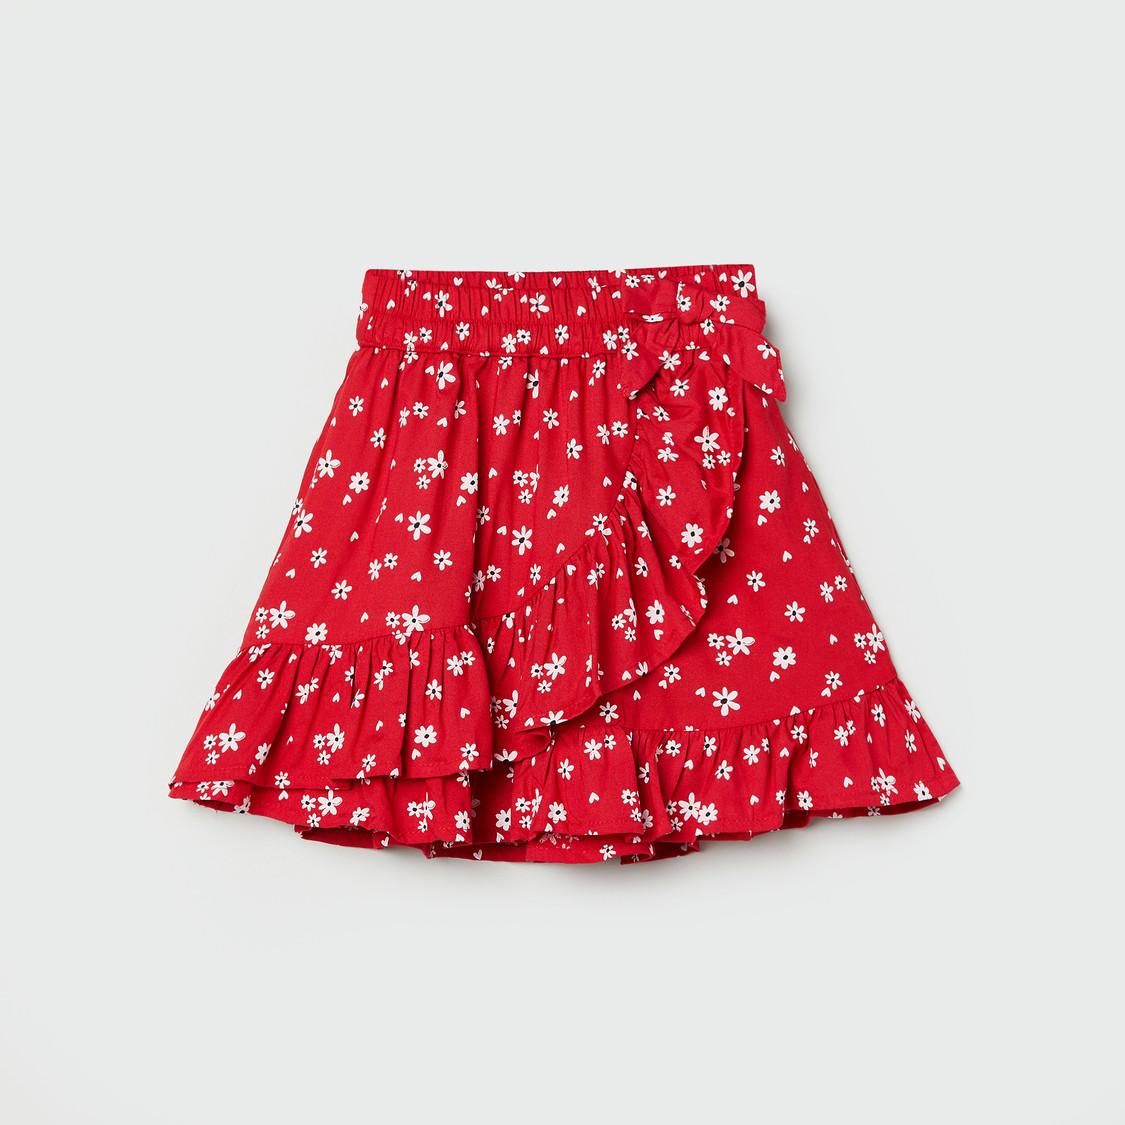 MAX Floral Print Ruffled A-Line Skirt